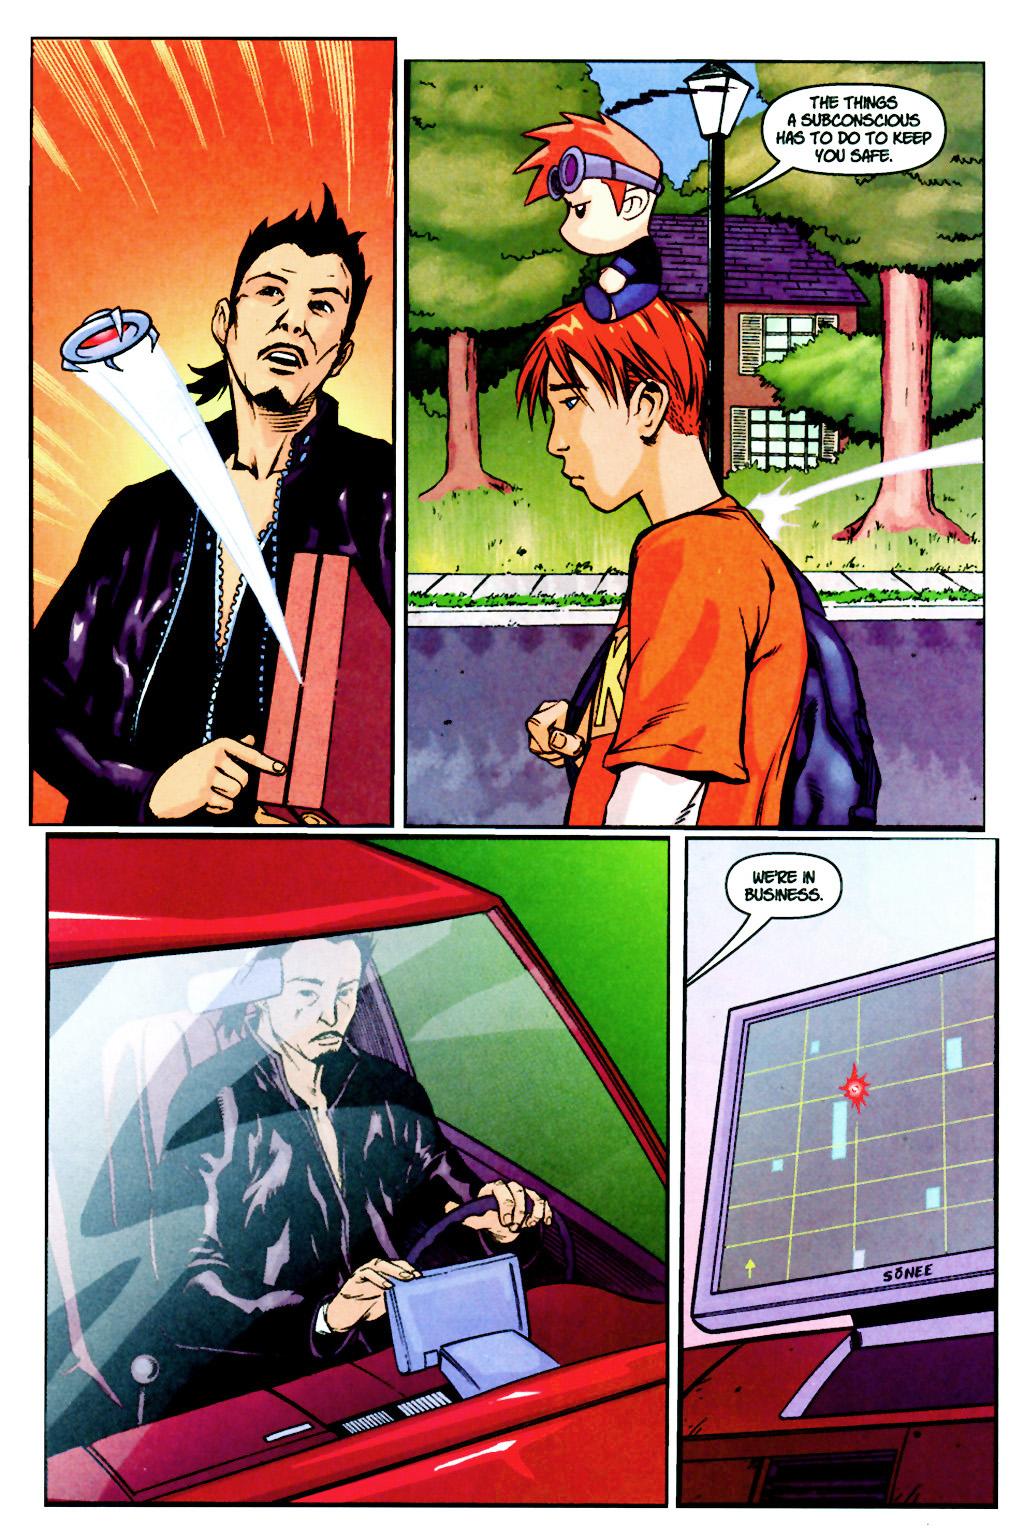 Read online SpyBoy: Final Exam comic -  Issue #2 - 9